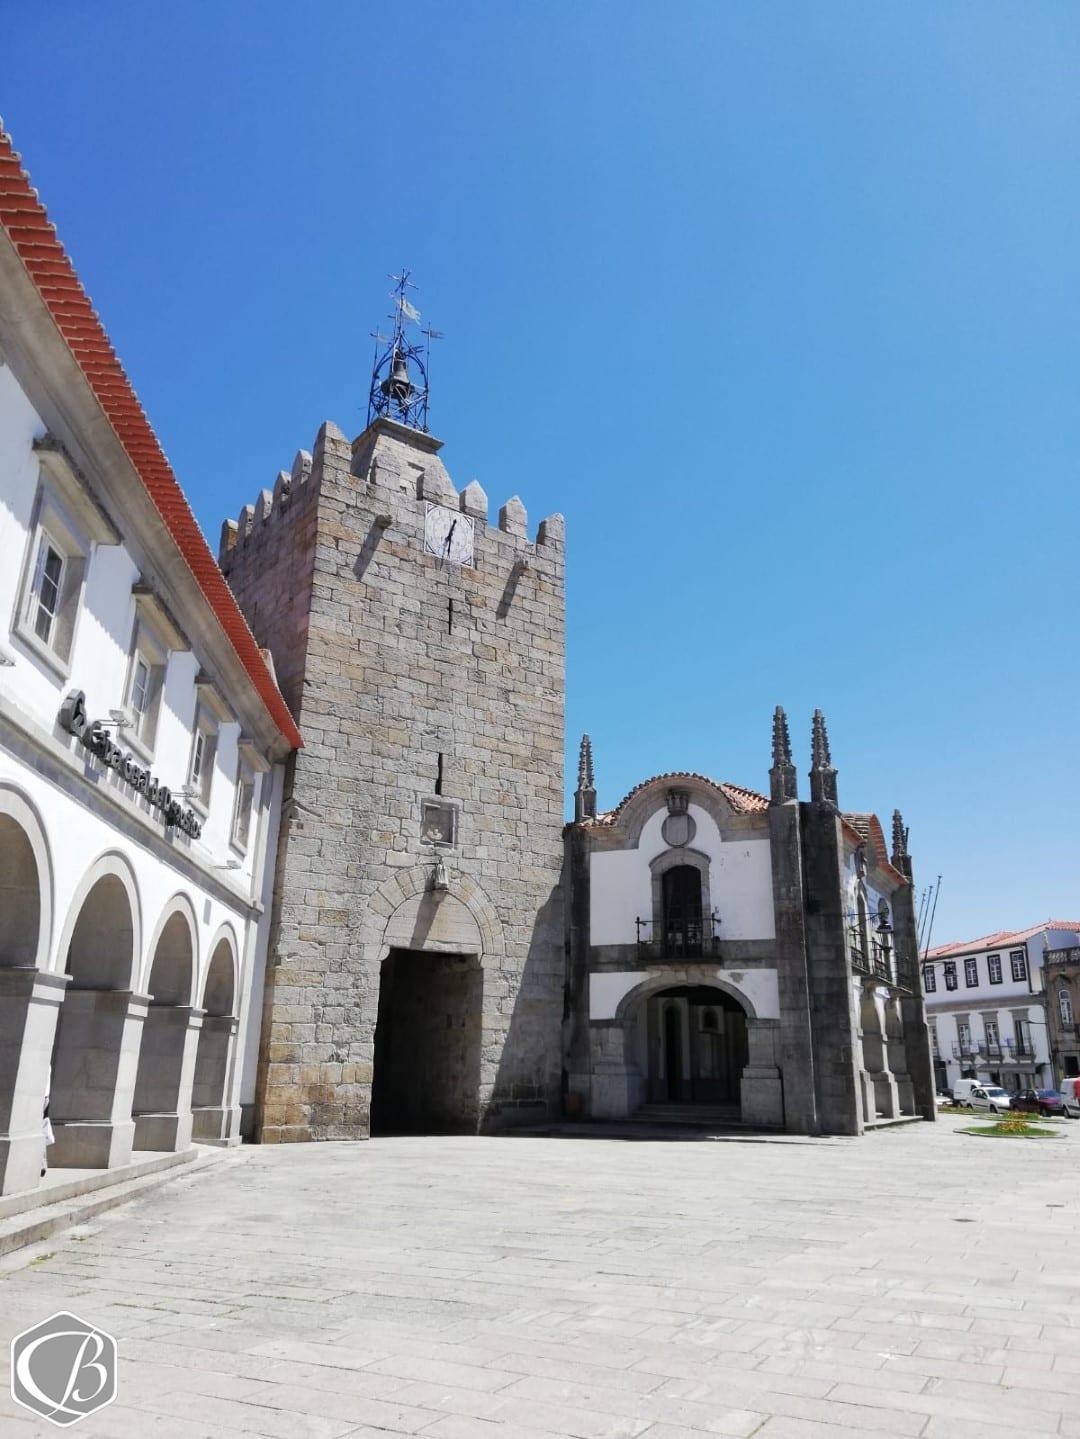 Portugal Moledo Fitnessreise Sporteventwoche Traumkulisse